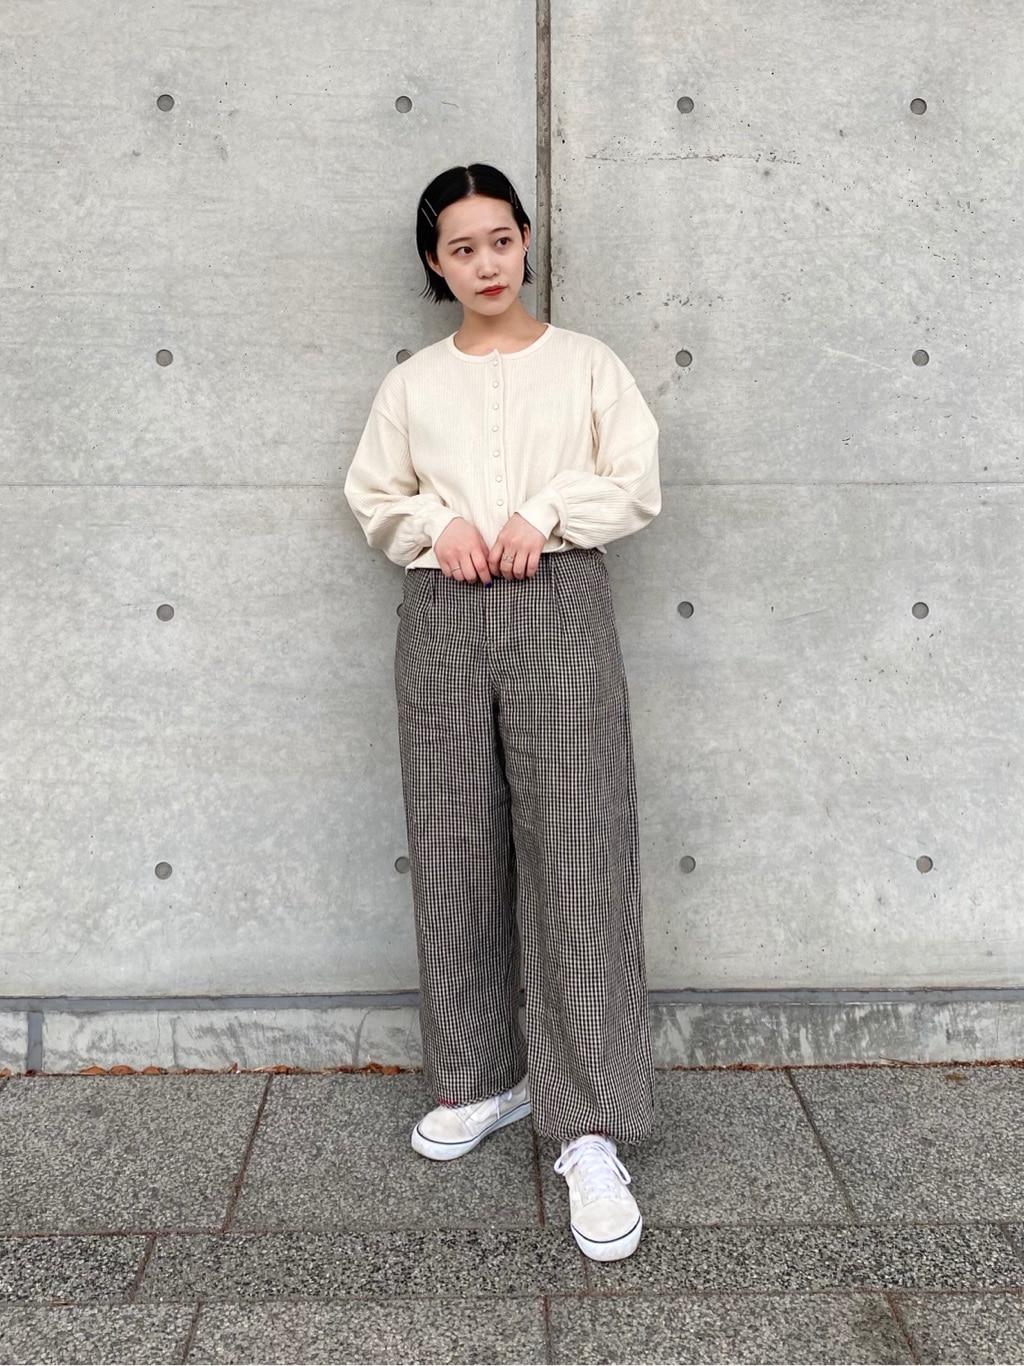 l'atelier du savon 新宿ミロード 身長:159cm 2021.04.14